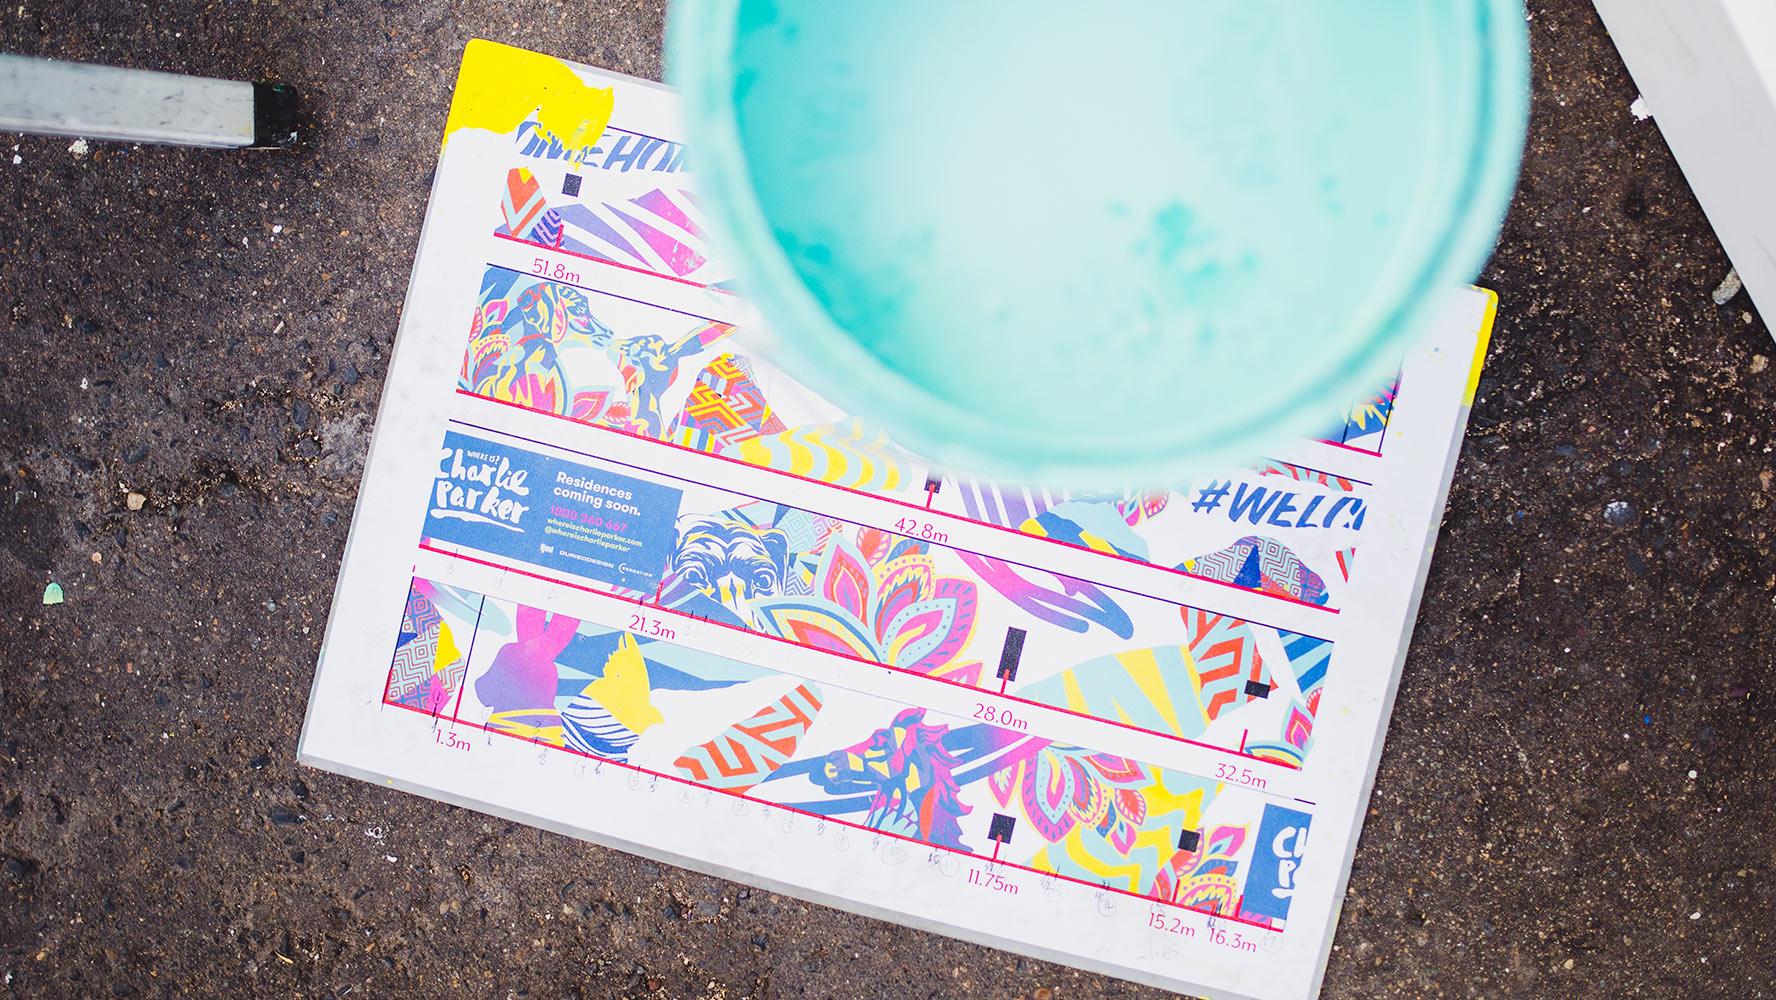 coronation_property_charlie_parker_sydney_property_campaign_mural_layout_3.jpg